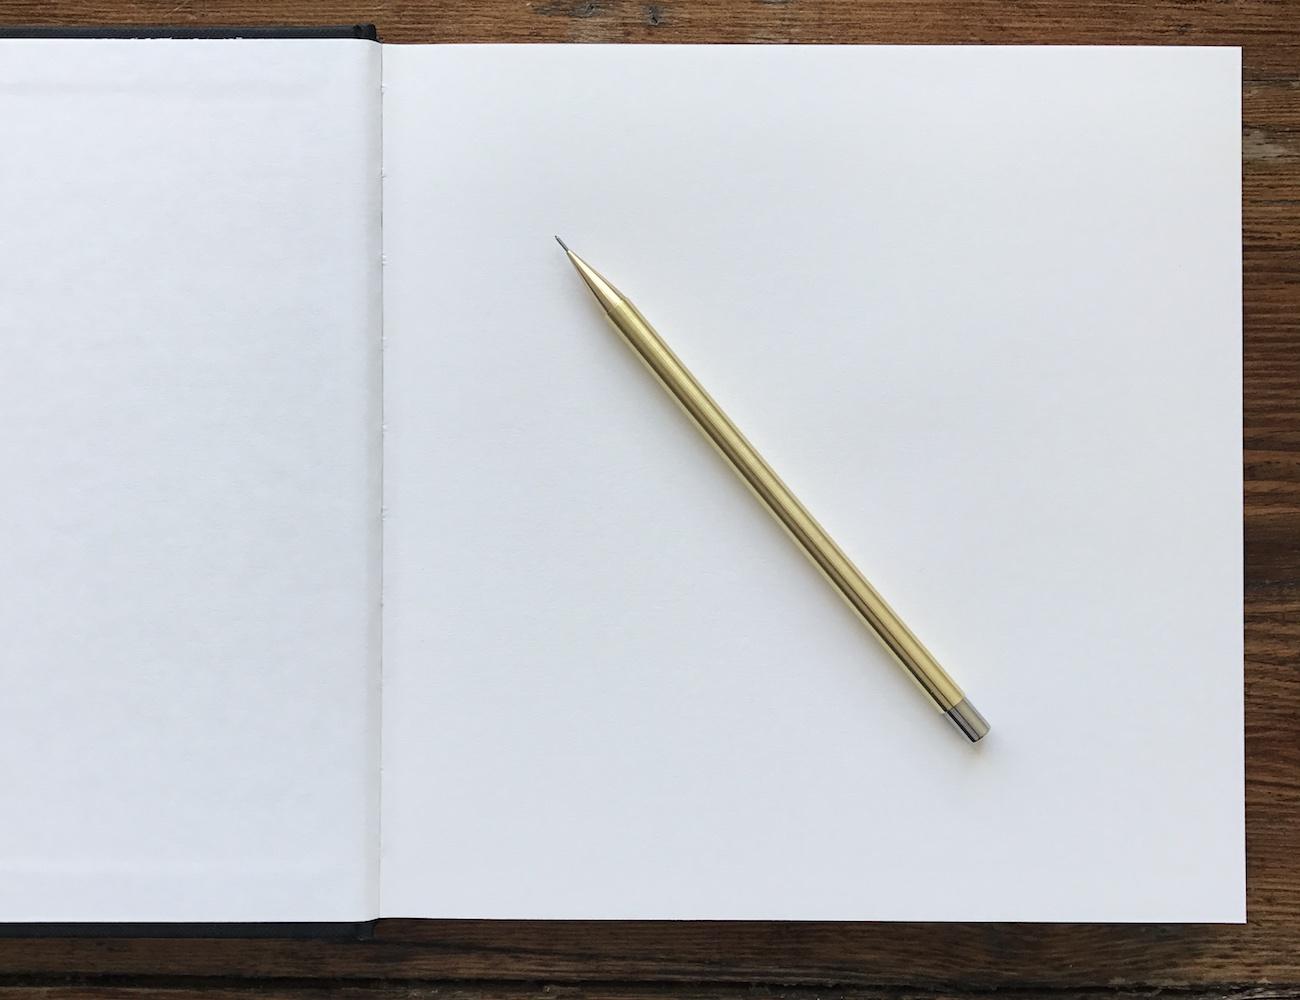 HEMI WORKS Handmade Brass Mechanical Pencil